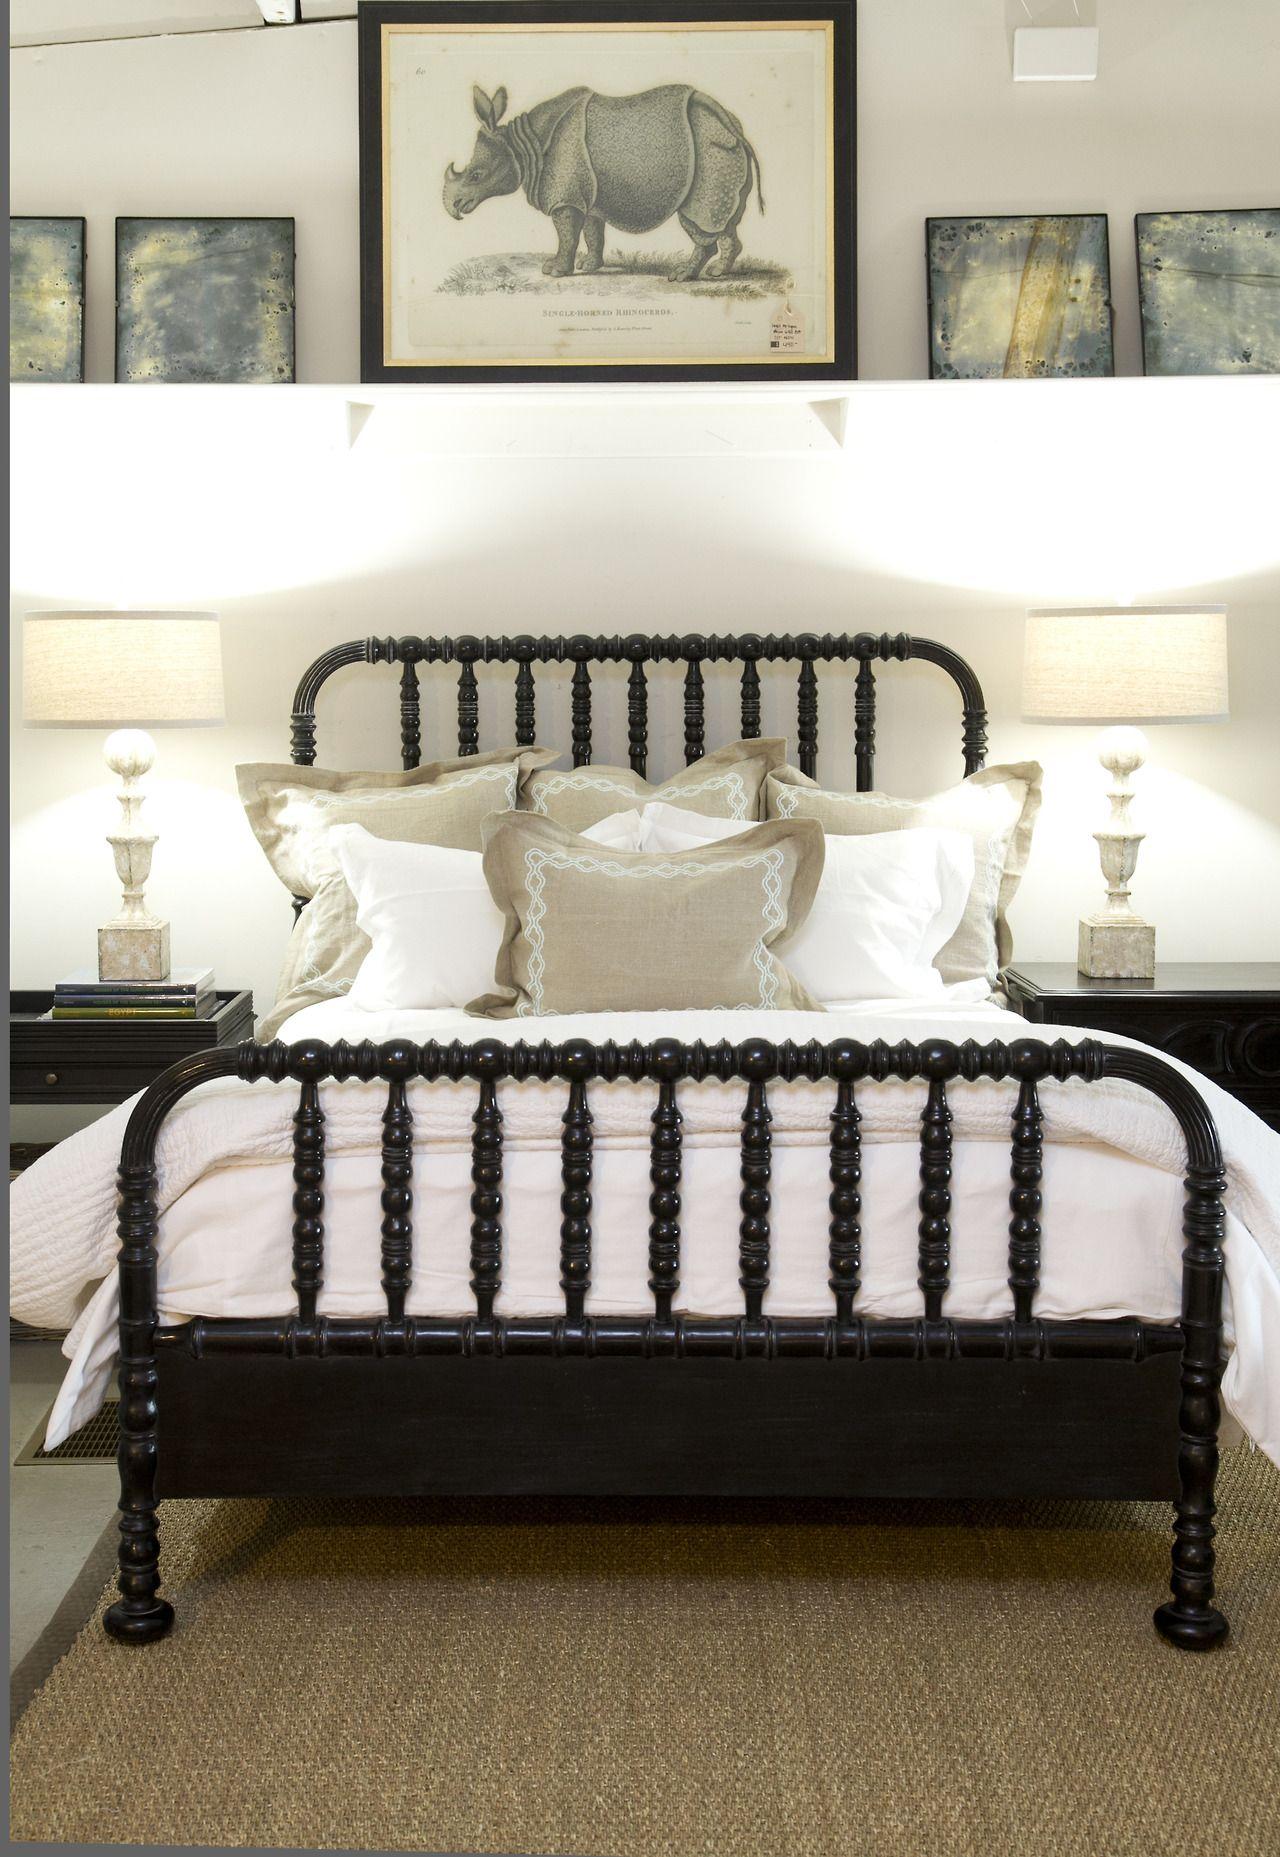 Black Spool Bed Gallery Shelf Bedrooms I Want To Sleep